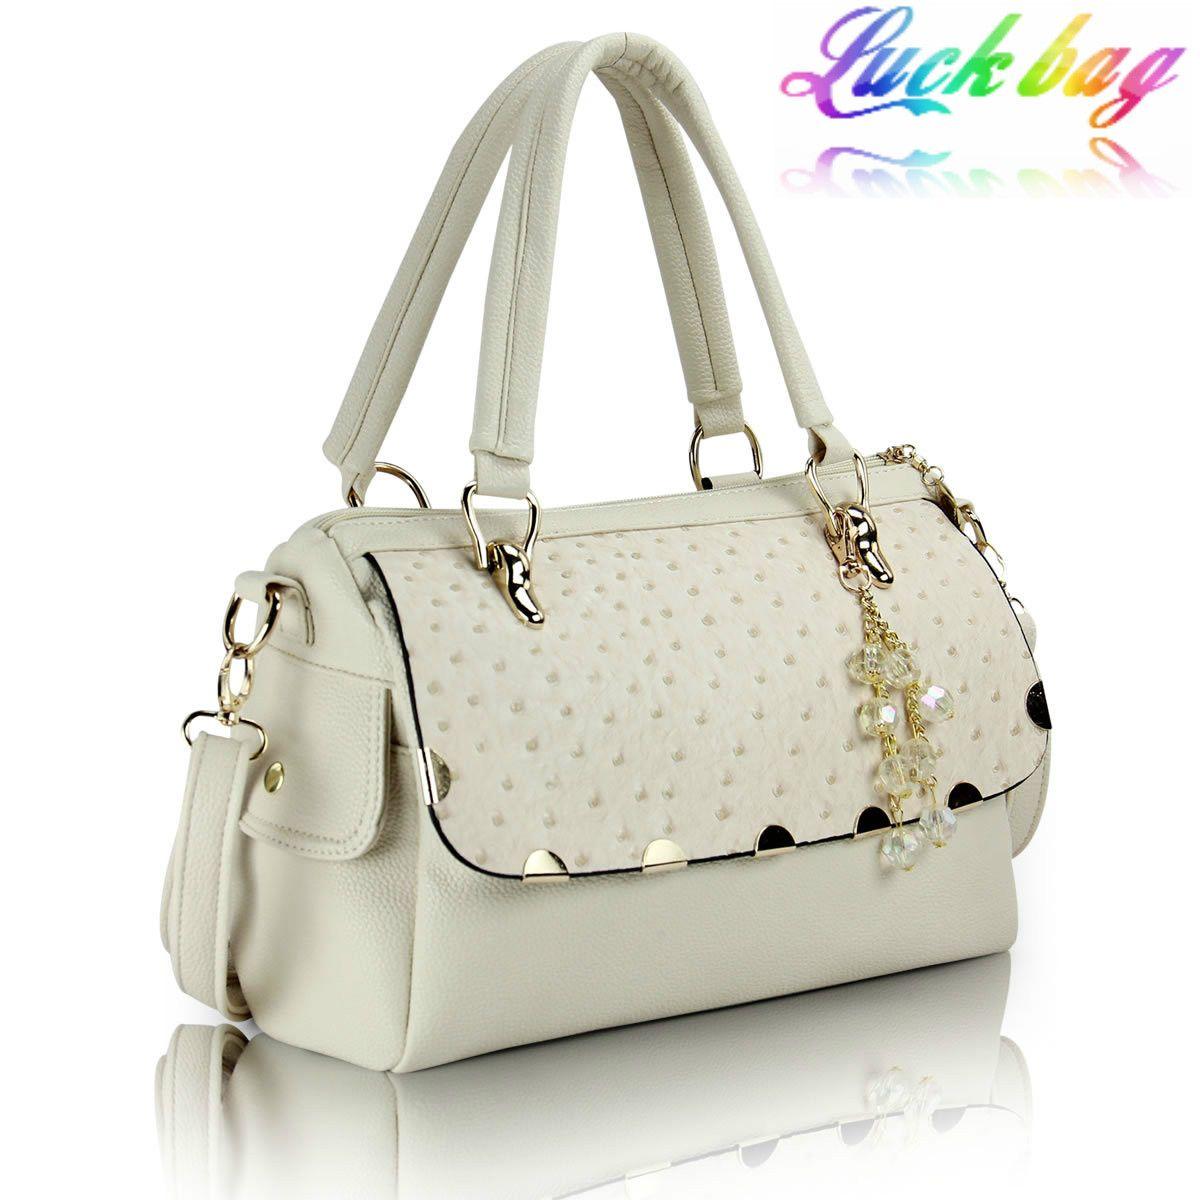 2013 fashion latest model fresh grace lady handbags singal